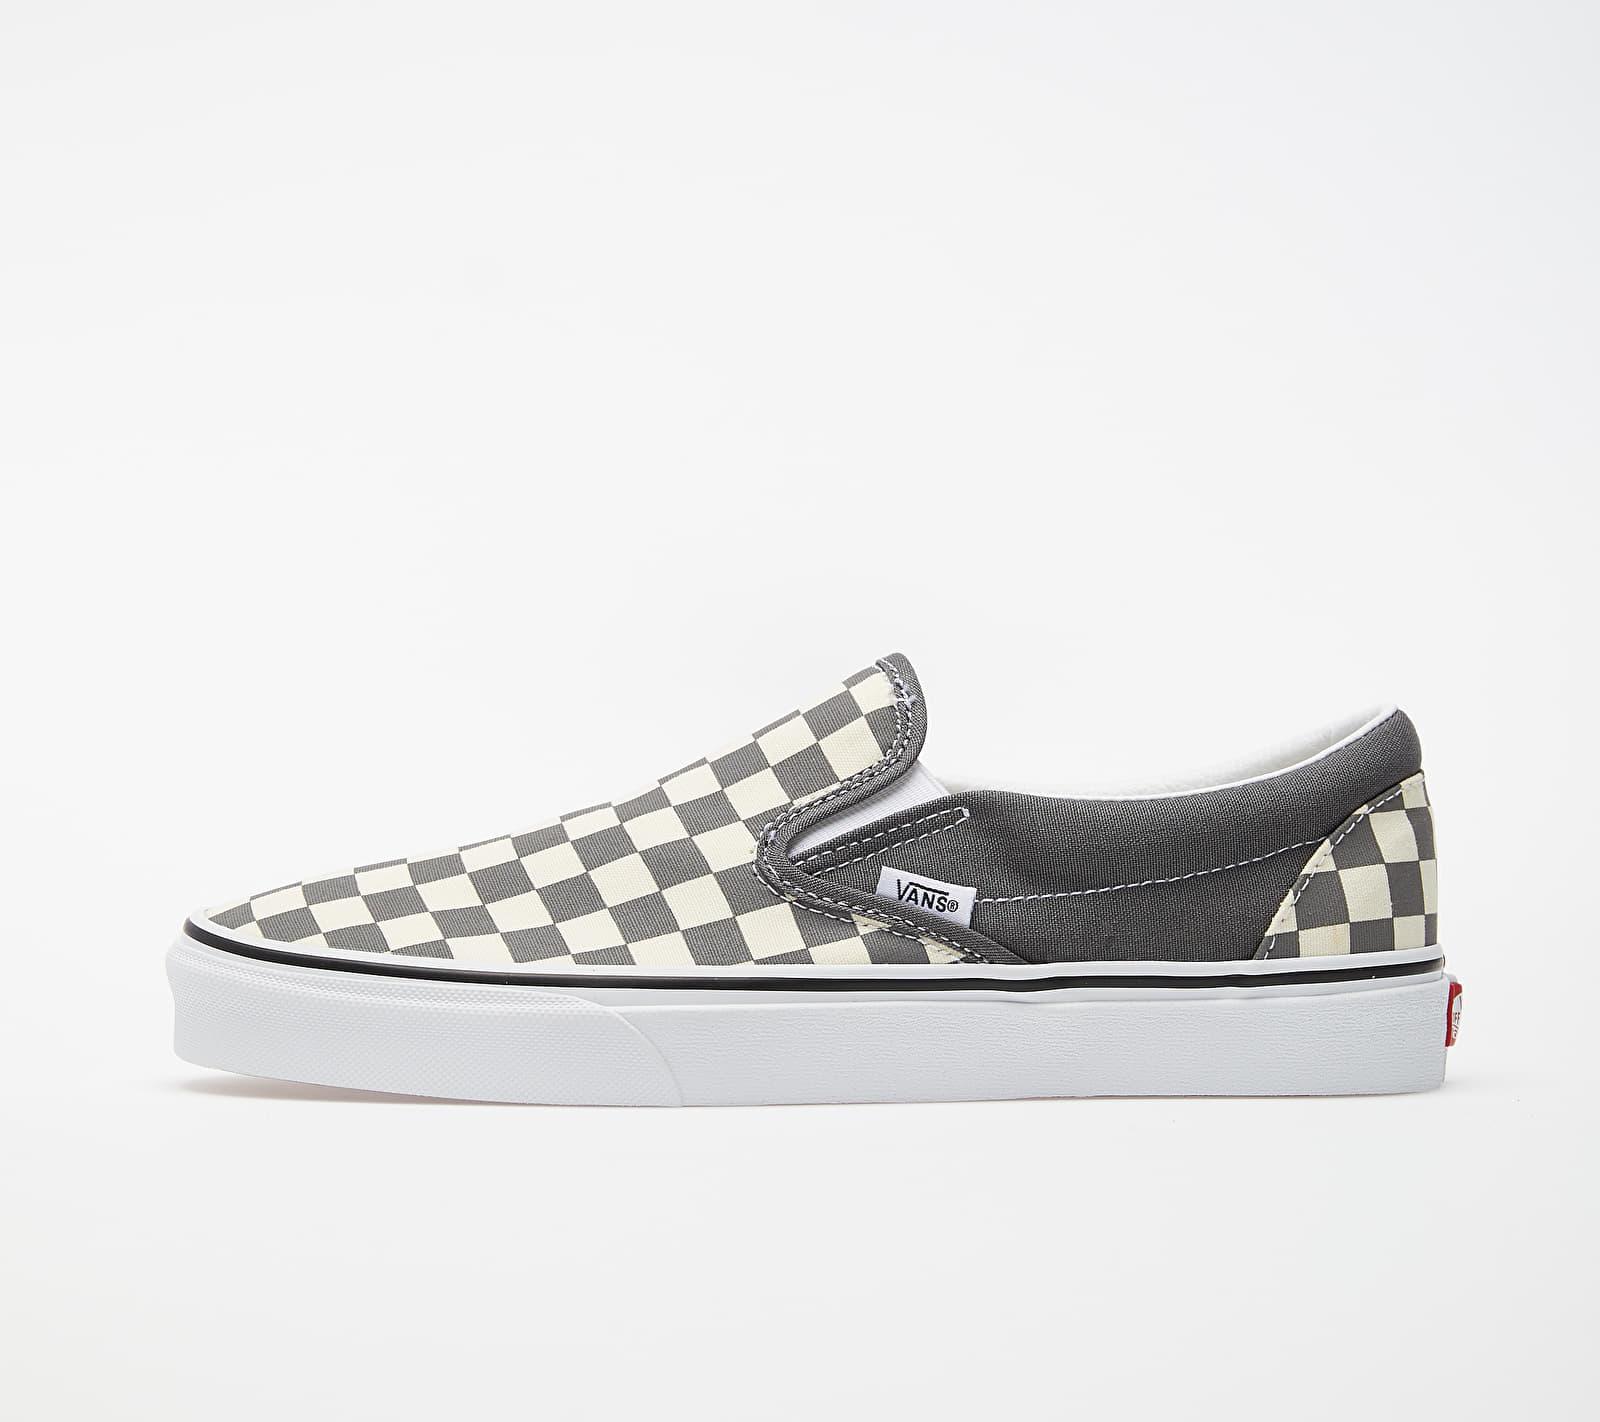 Vans Classic Slip-On (Checkerboard) Pewter/ True White EUR 42.5